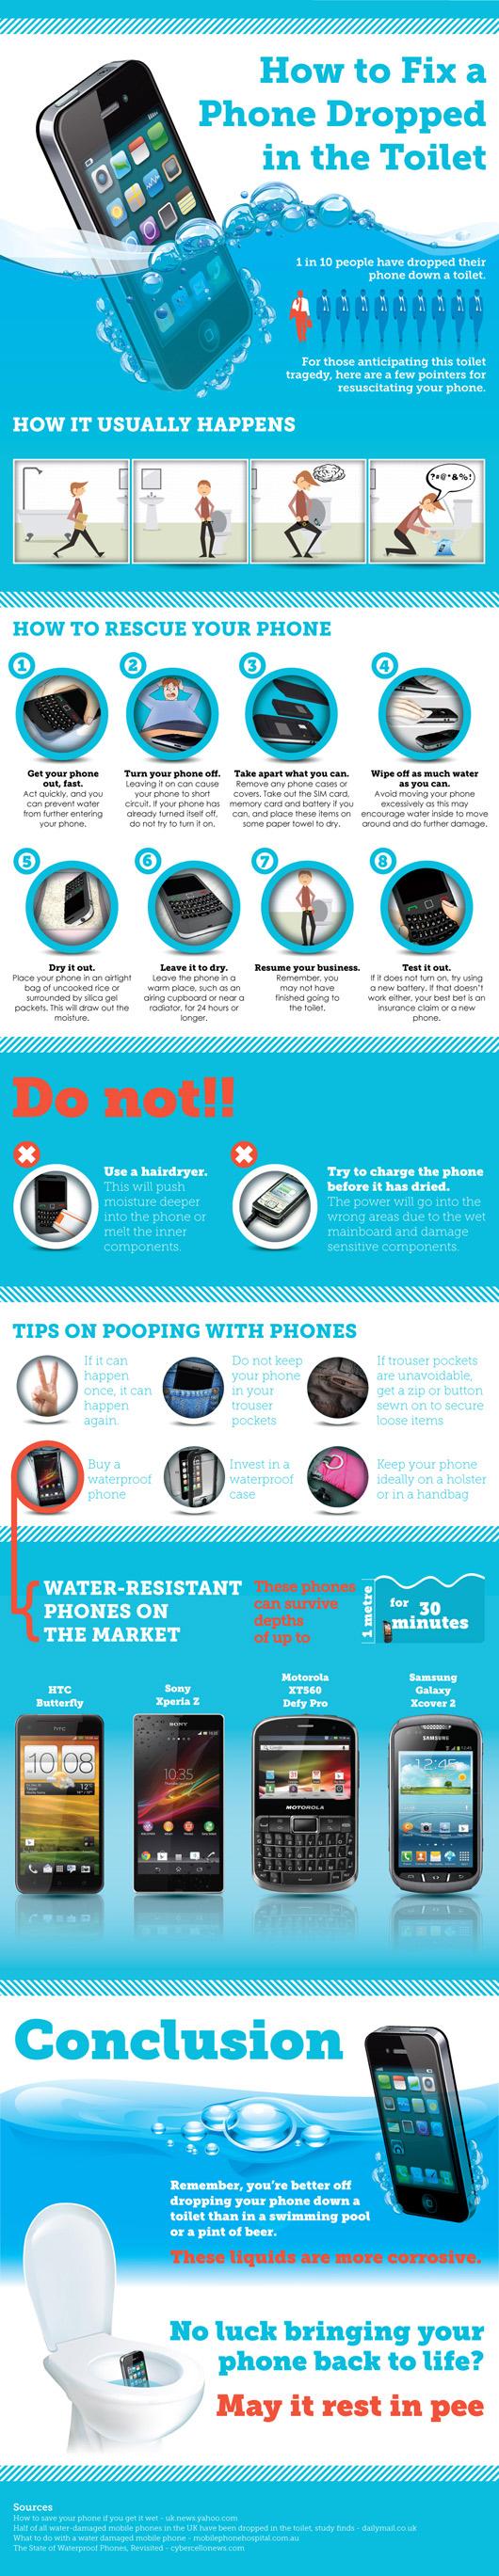 اینفوگرافیک نجات تلفن همراه